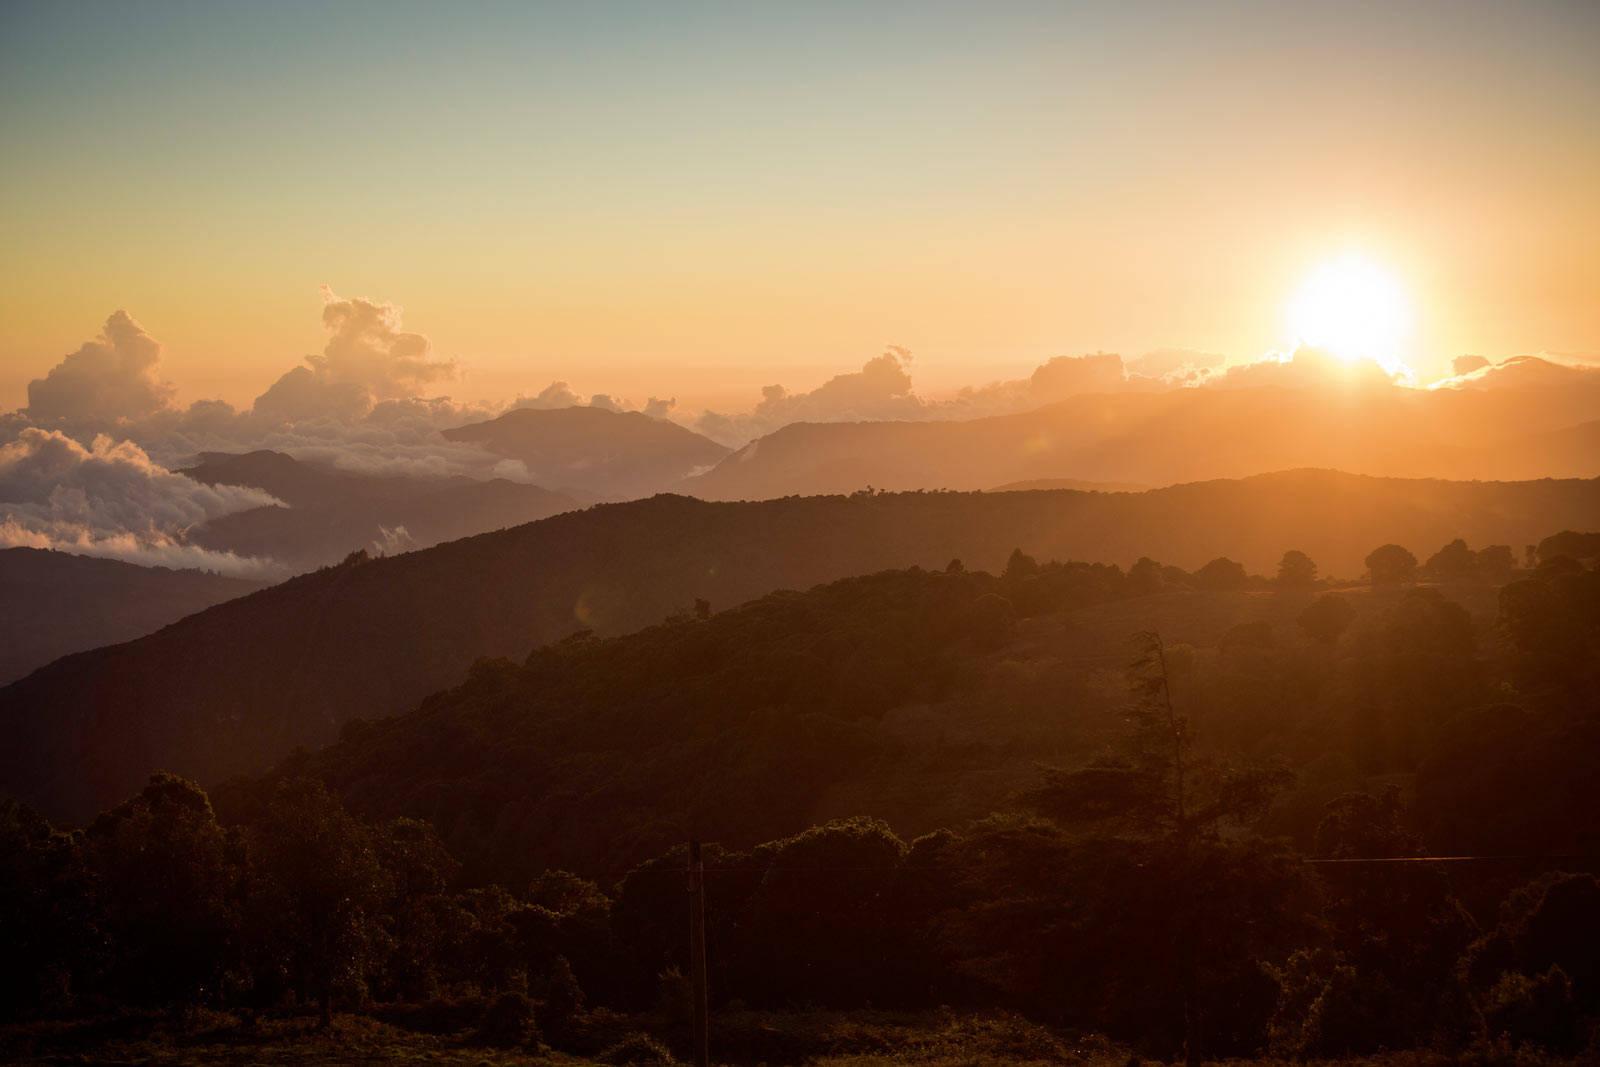 Stisykling-Costa-Rica-11